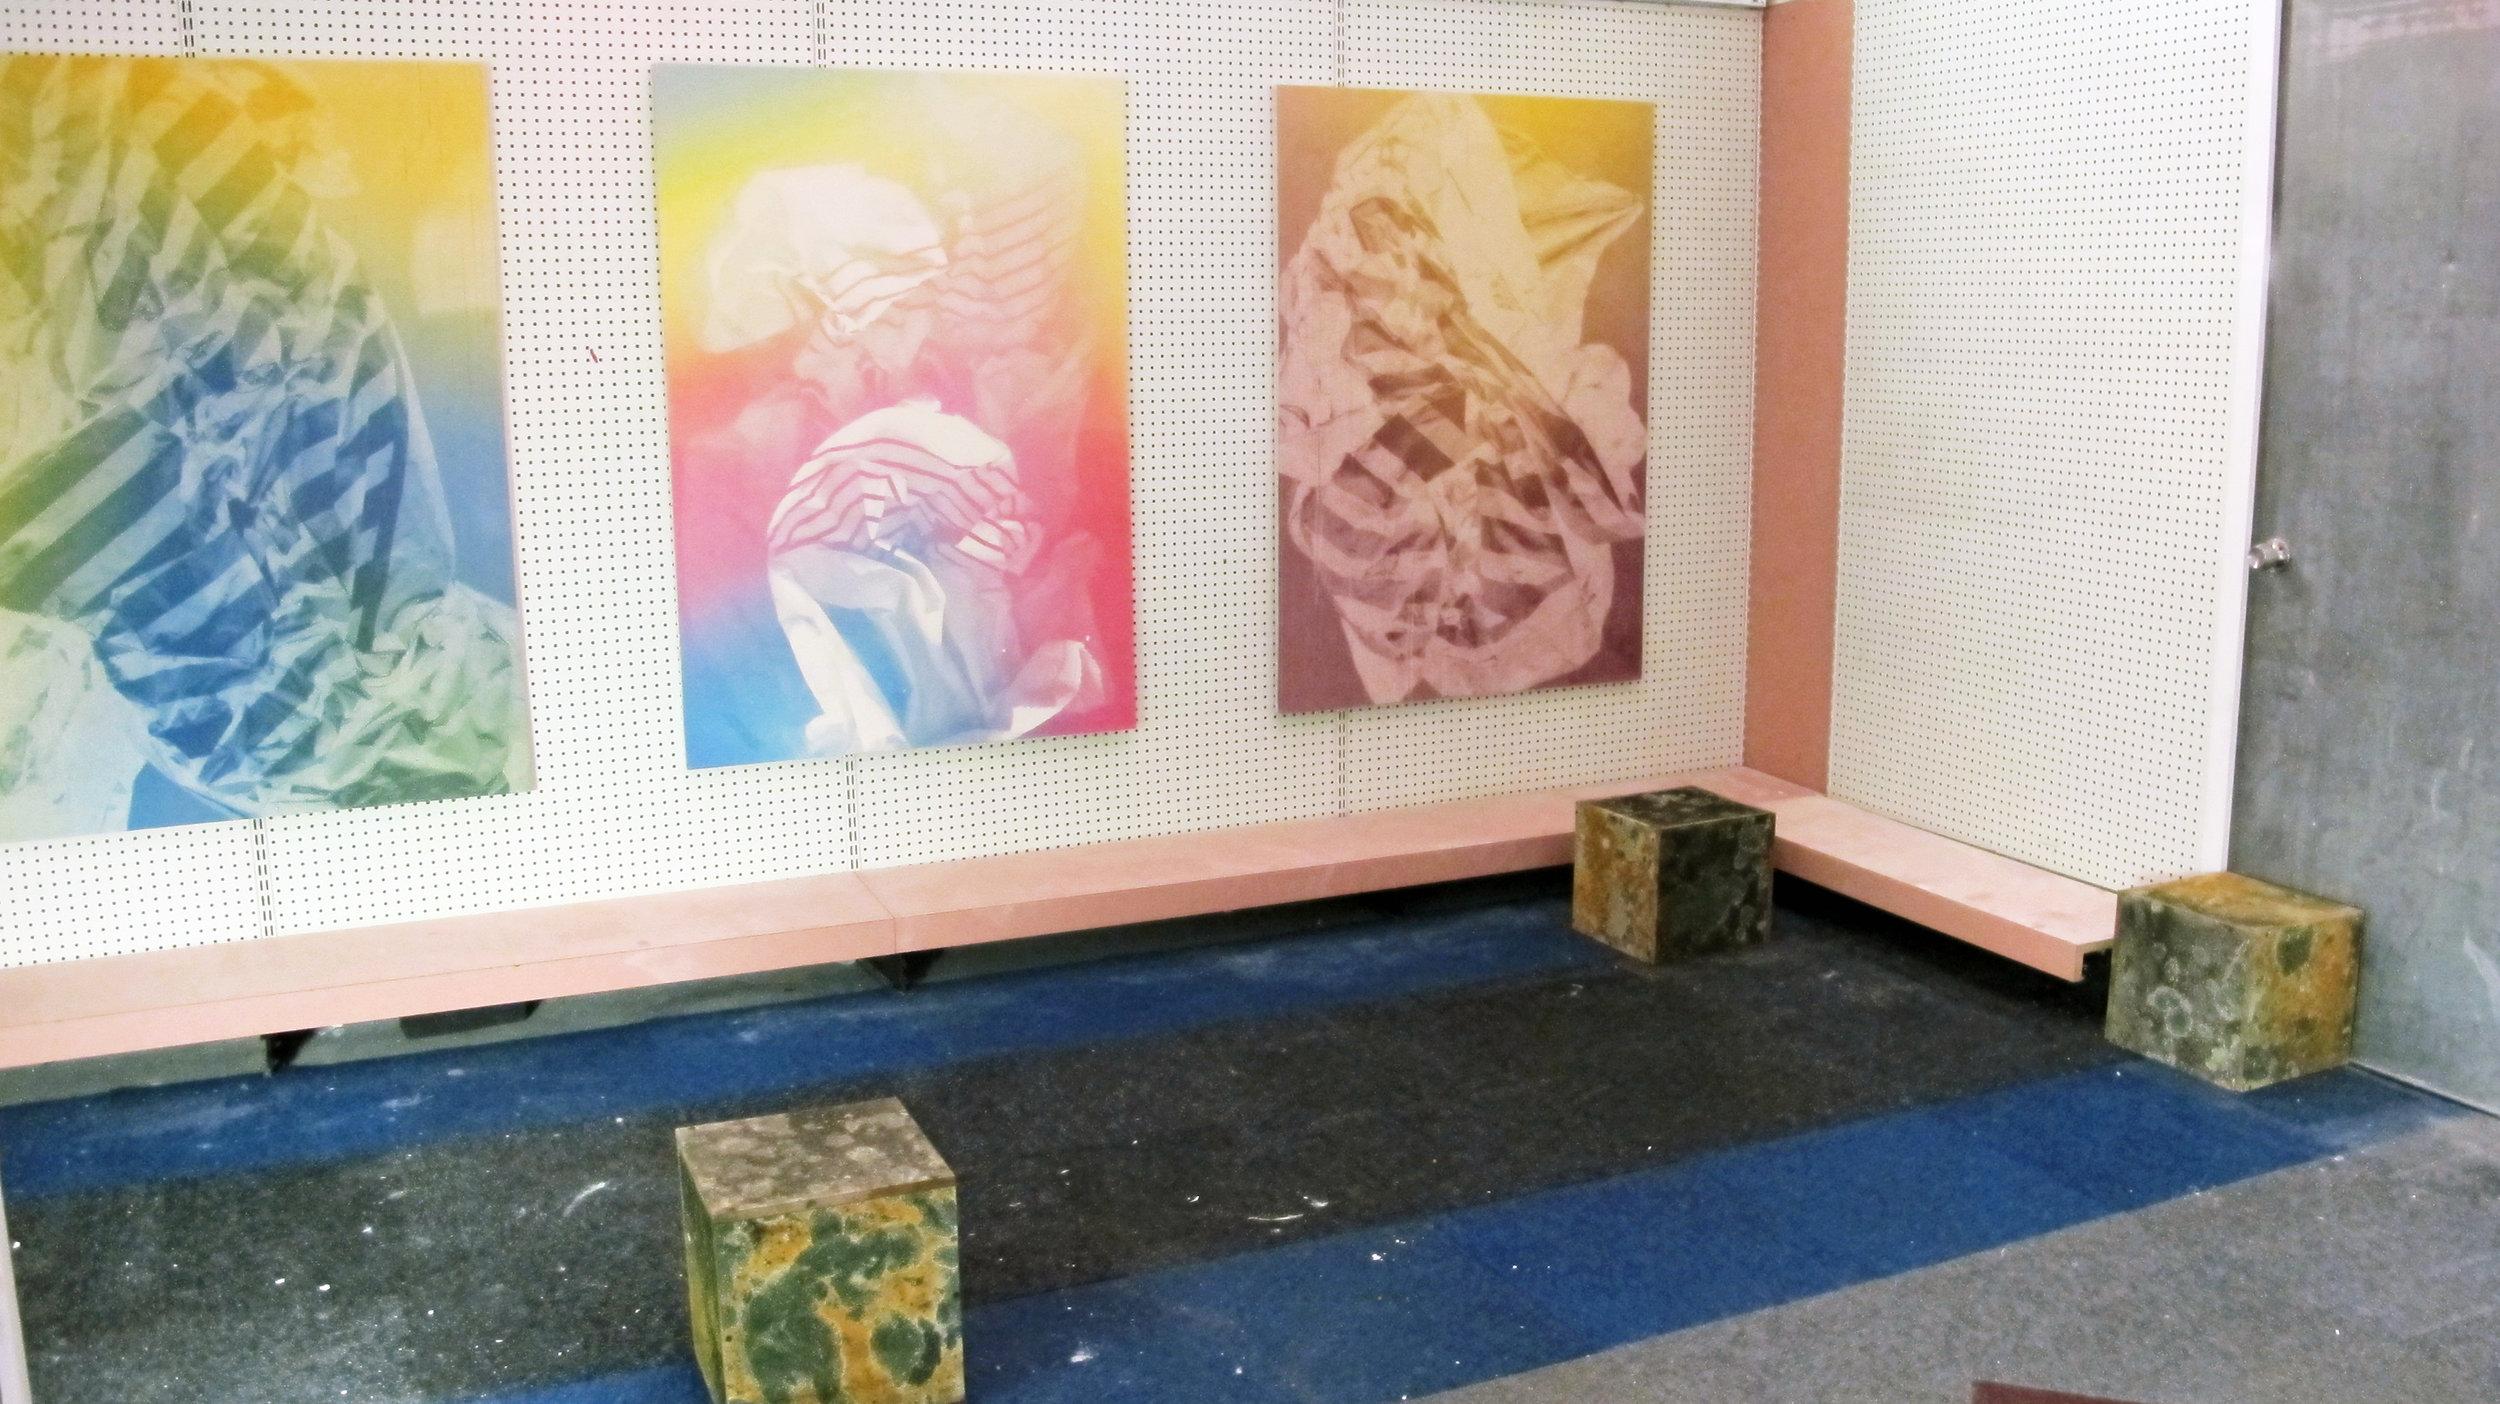 Freeman-Lowe, PANOPTICUM, Robert Miller Gallery, Installation View 26.JPG